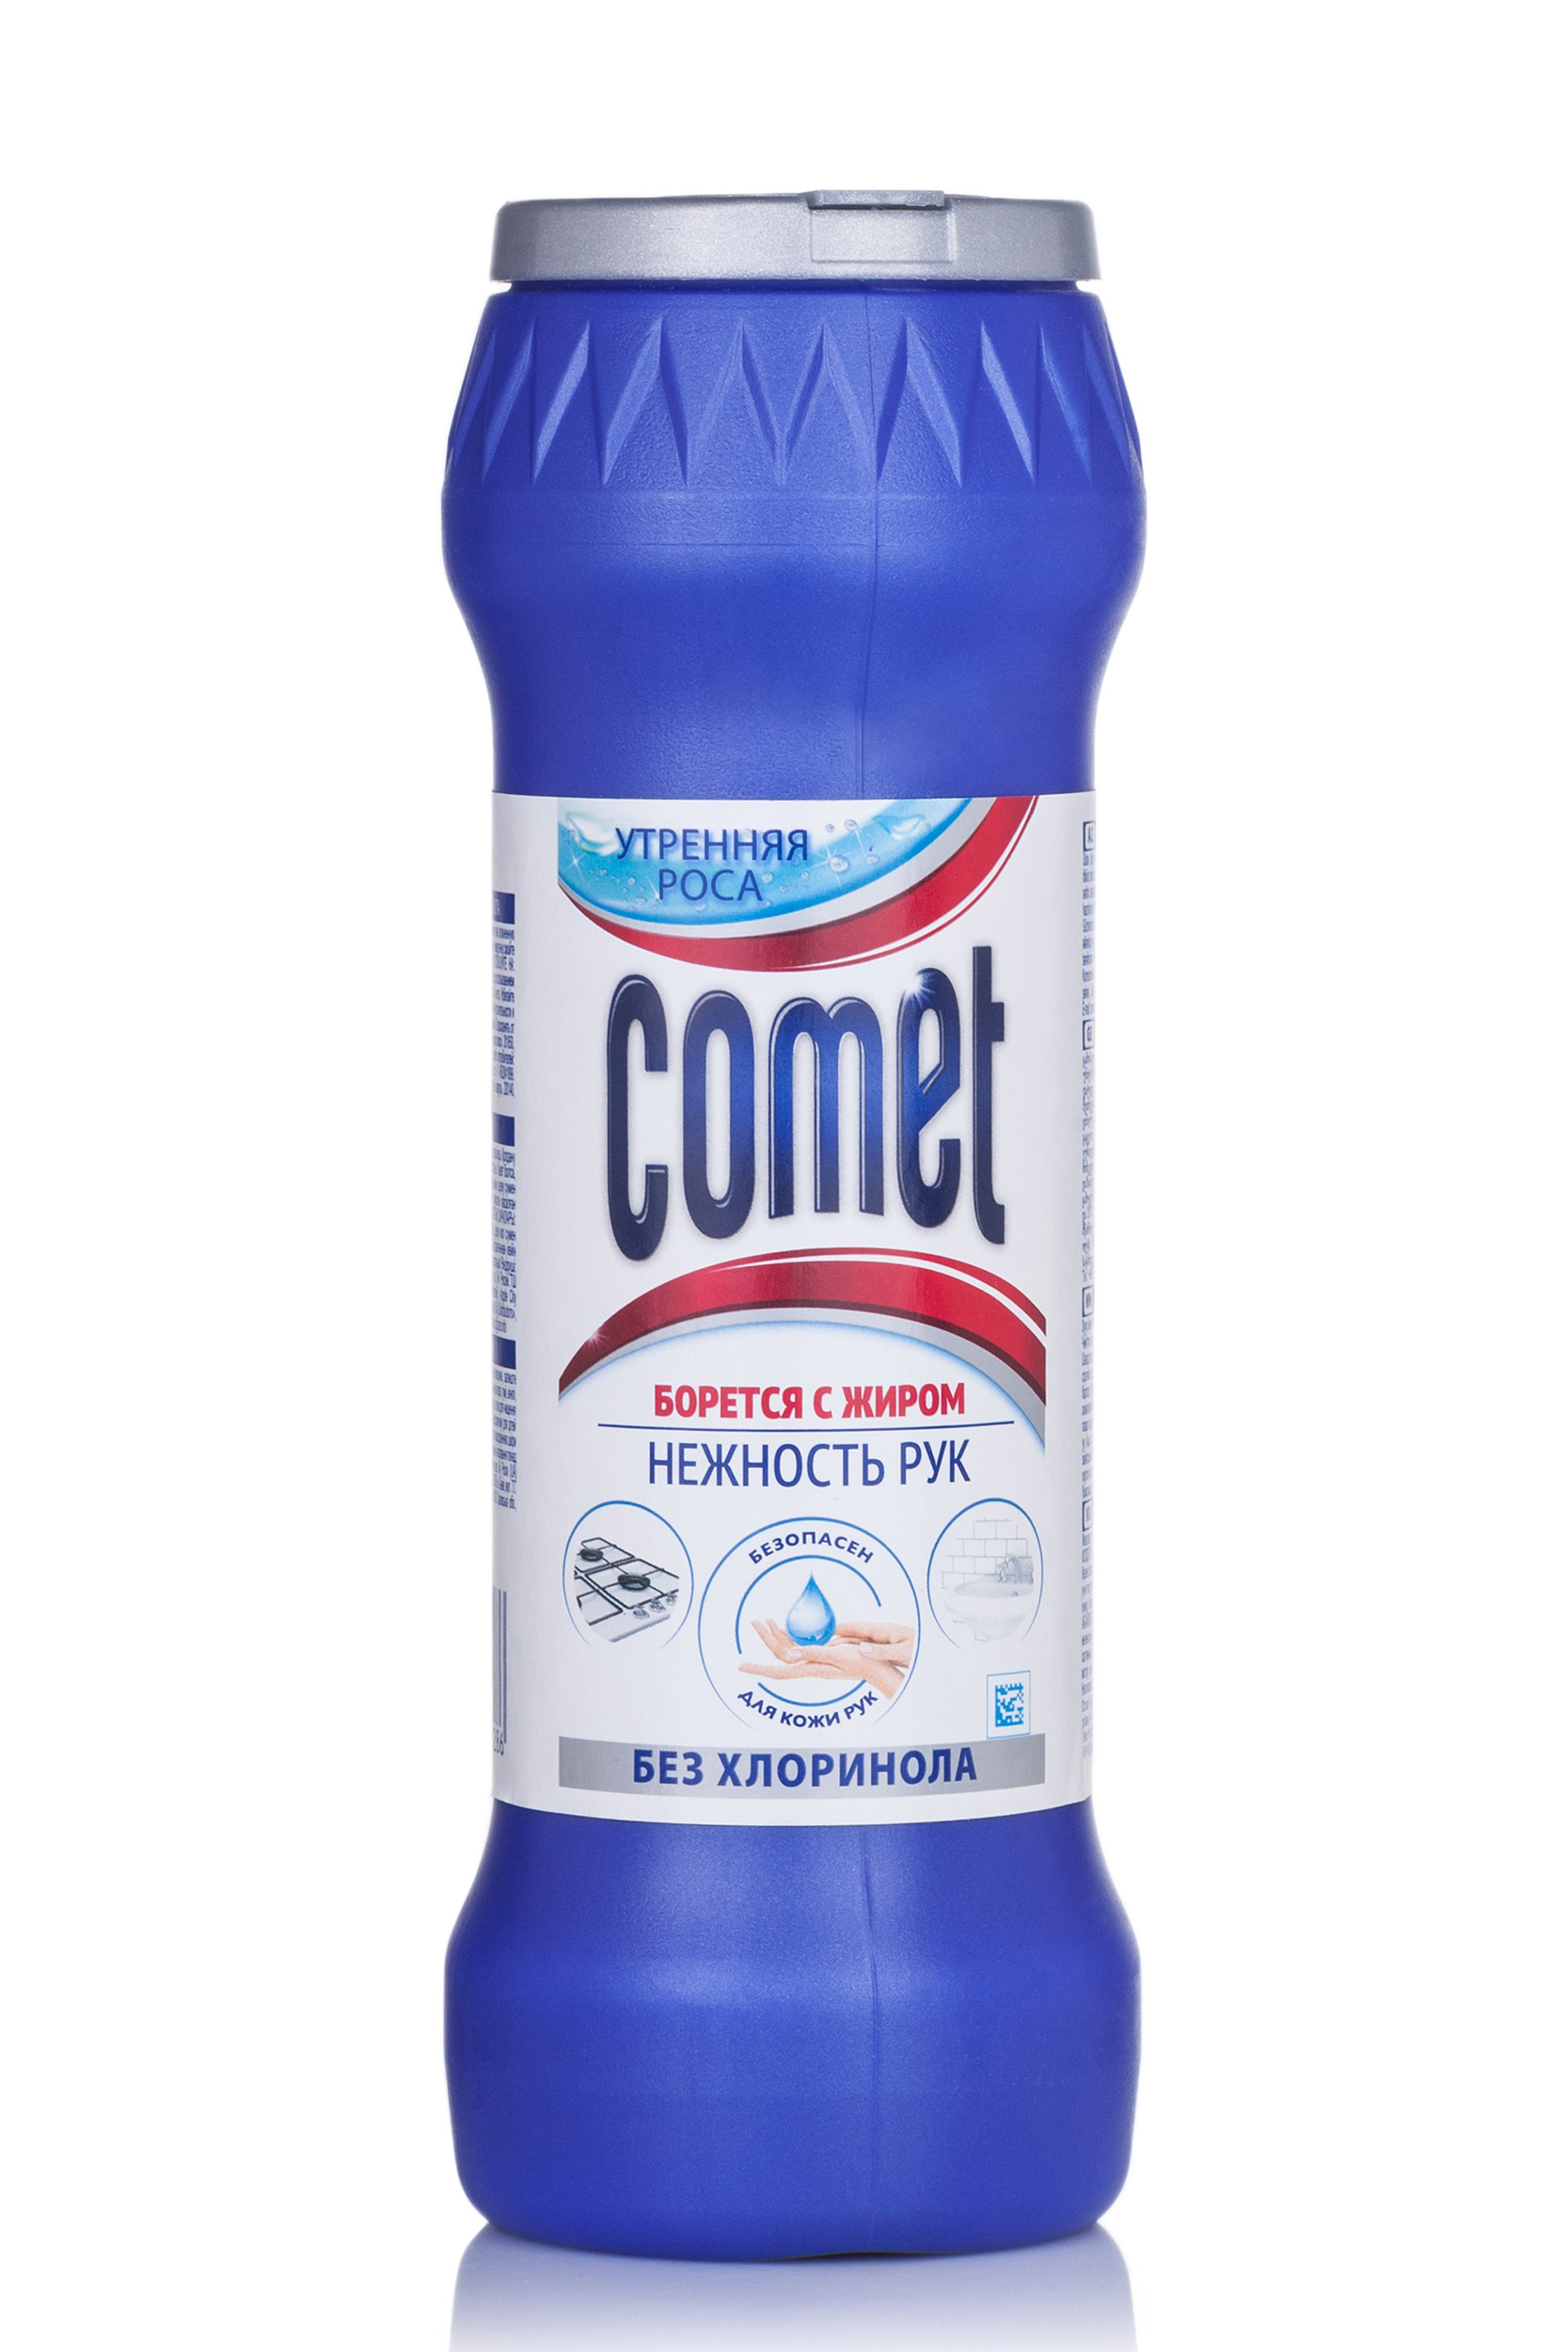 Чистящий Порошок Comet Утренняя роса без хлоринола , 475г